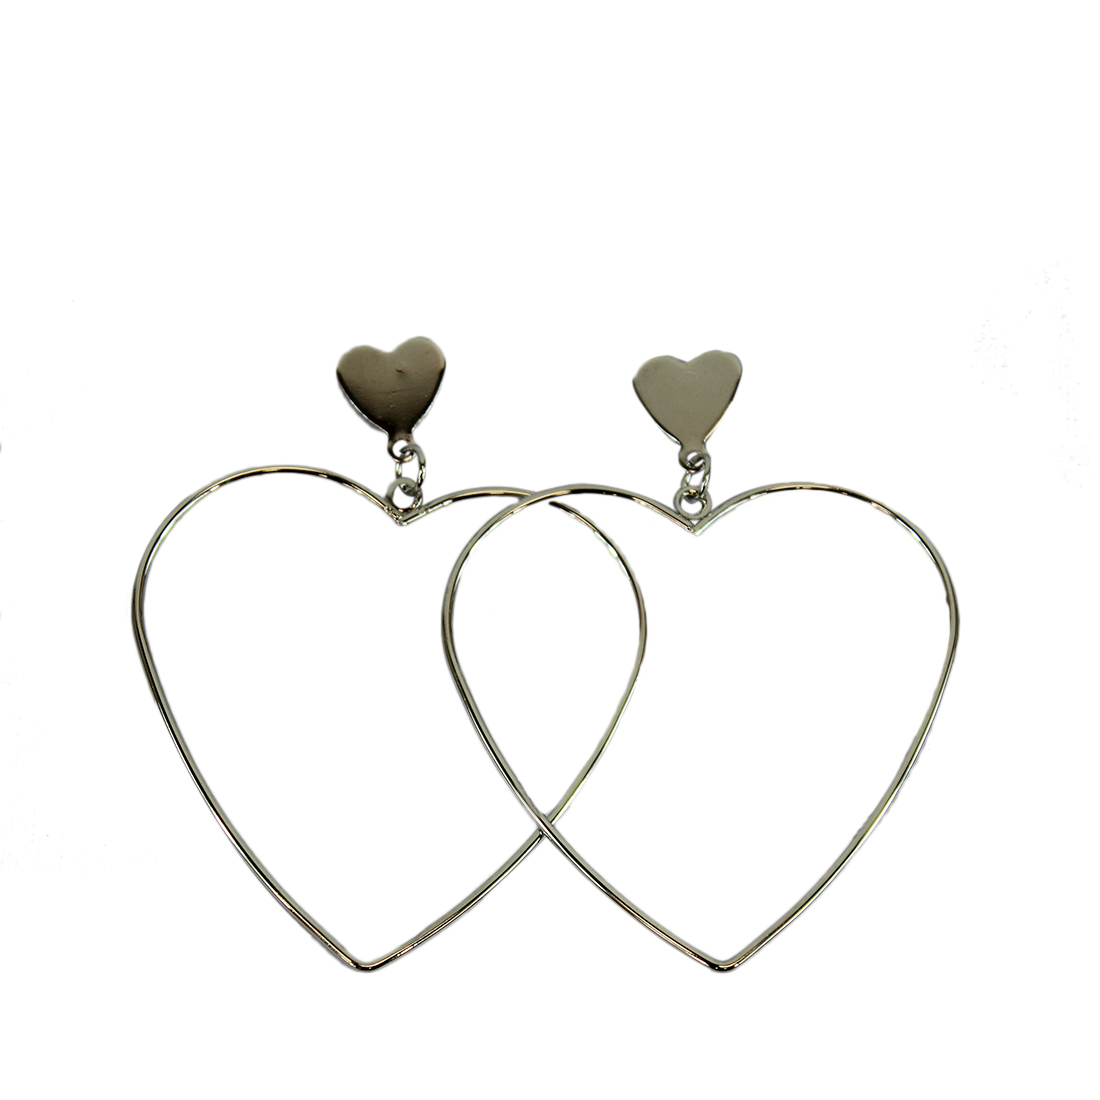 * Big And Small Heart Design